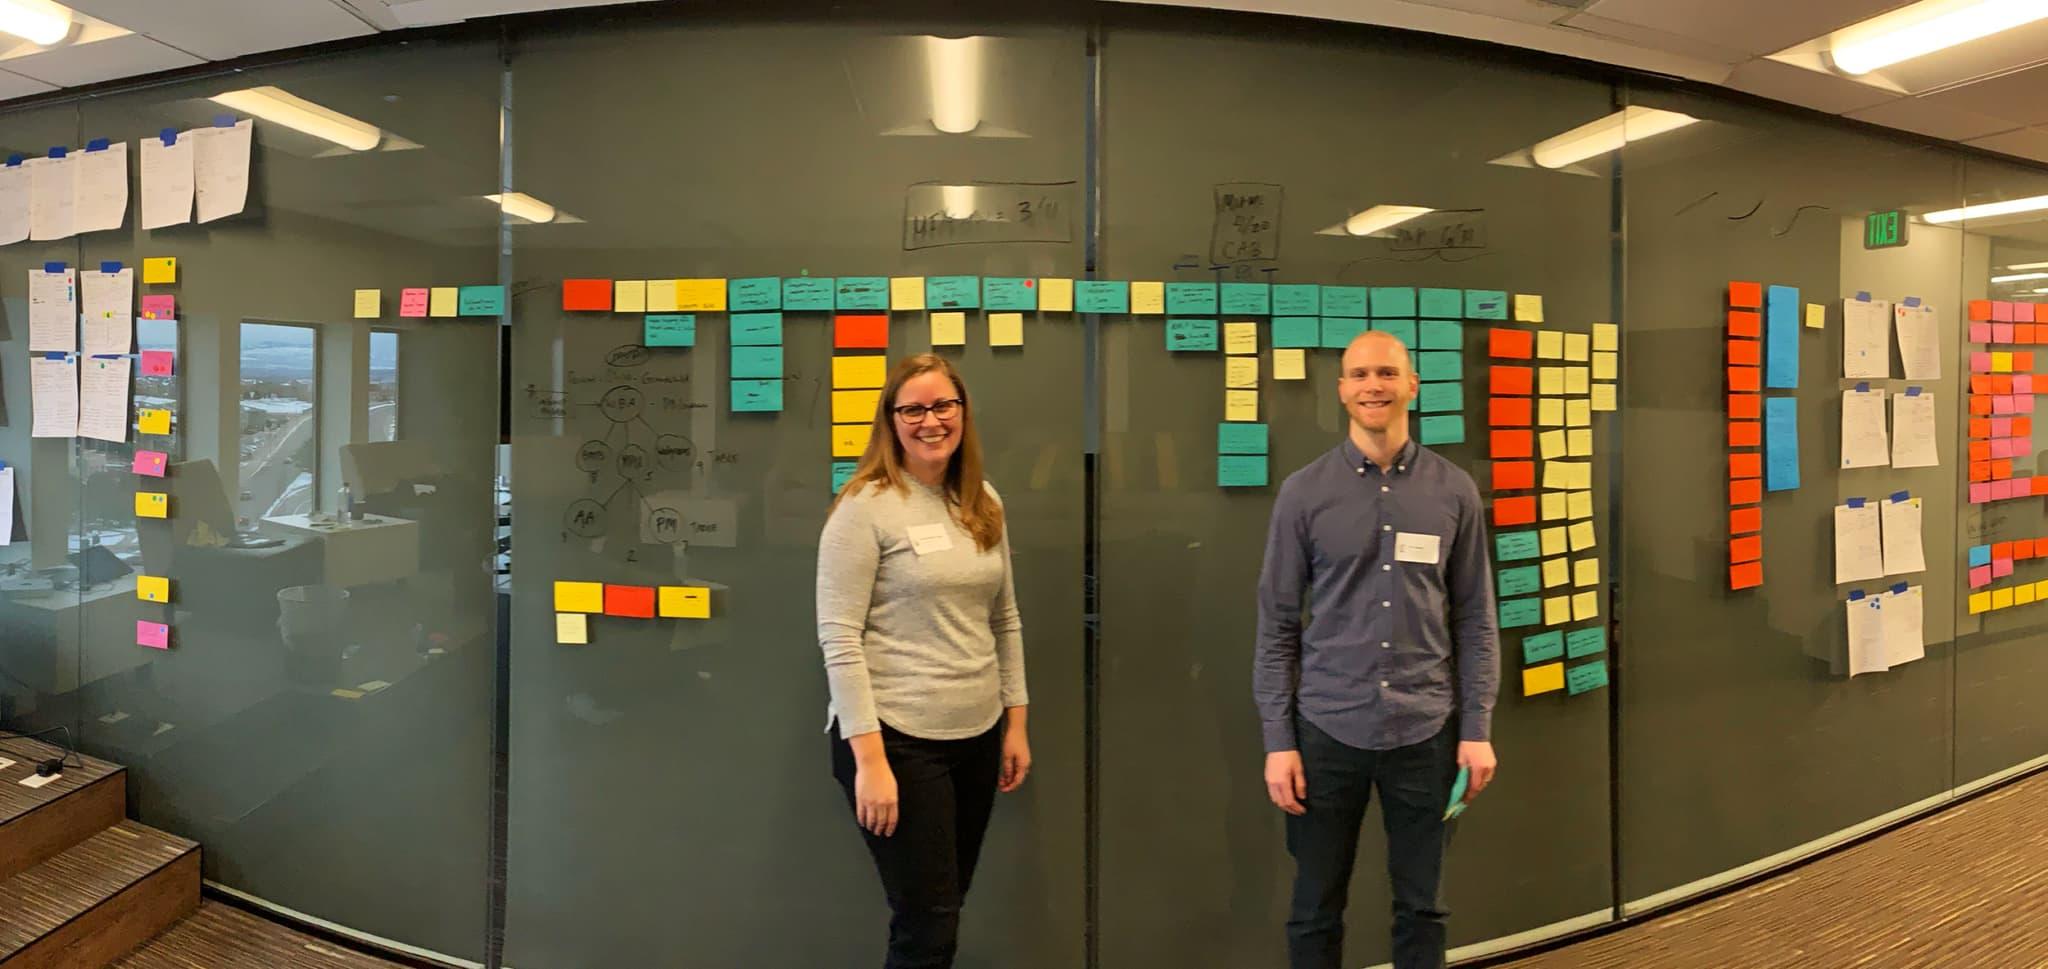 Modus Kickstart in Action - Workshop in Progress